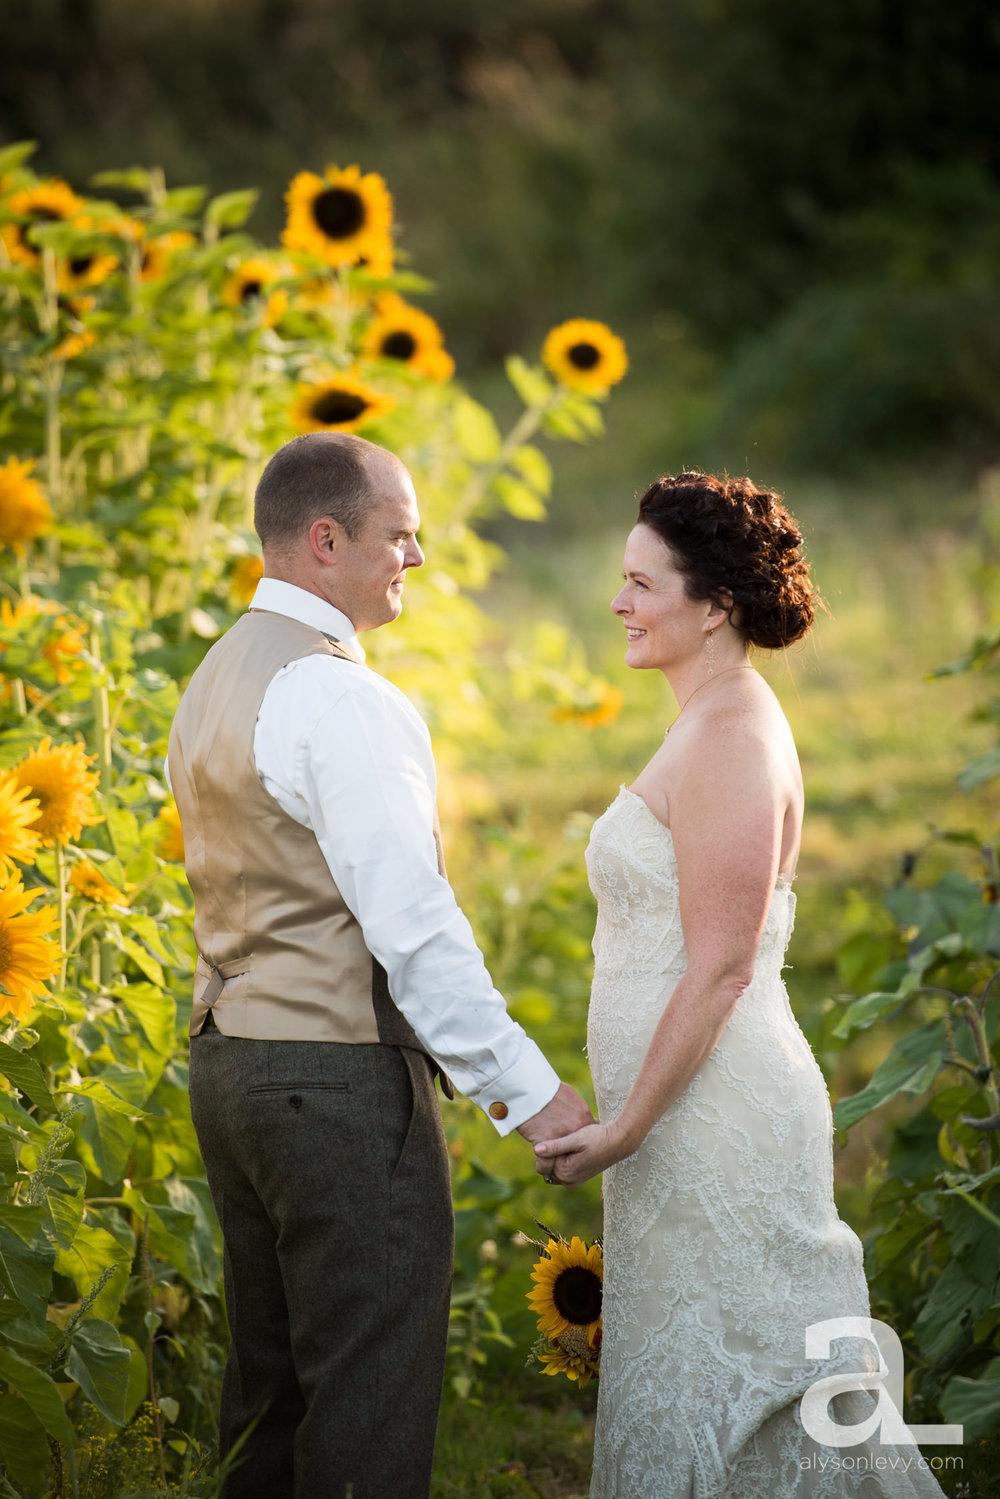 Krugers-Farm-Sauvie-Island-Wedding-Photography-022.jpg